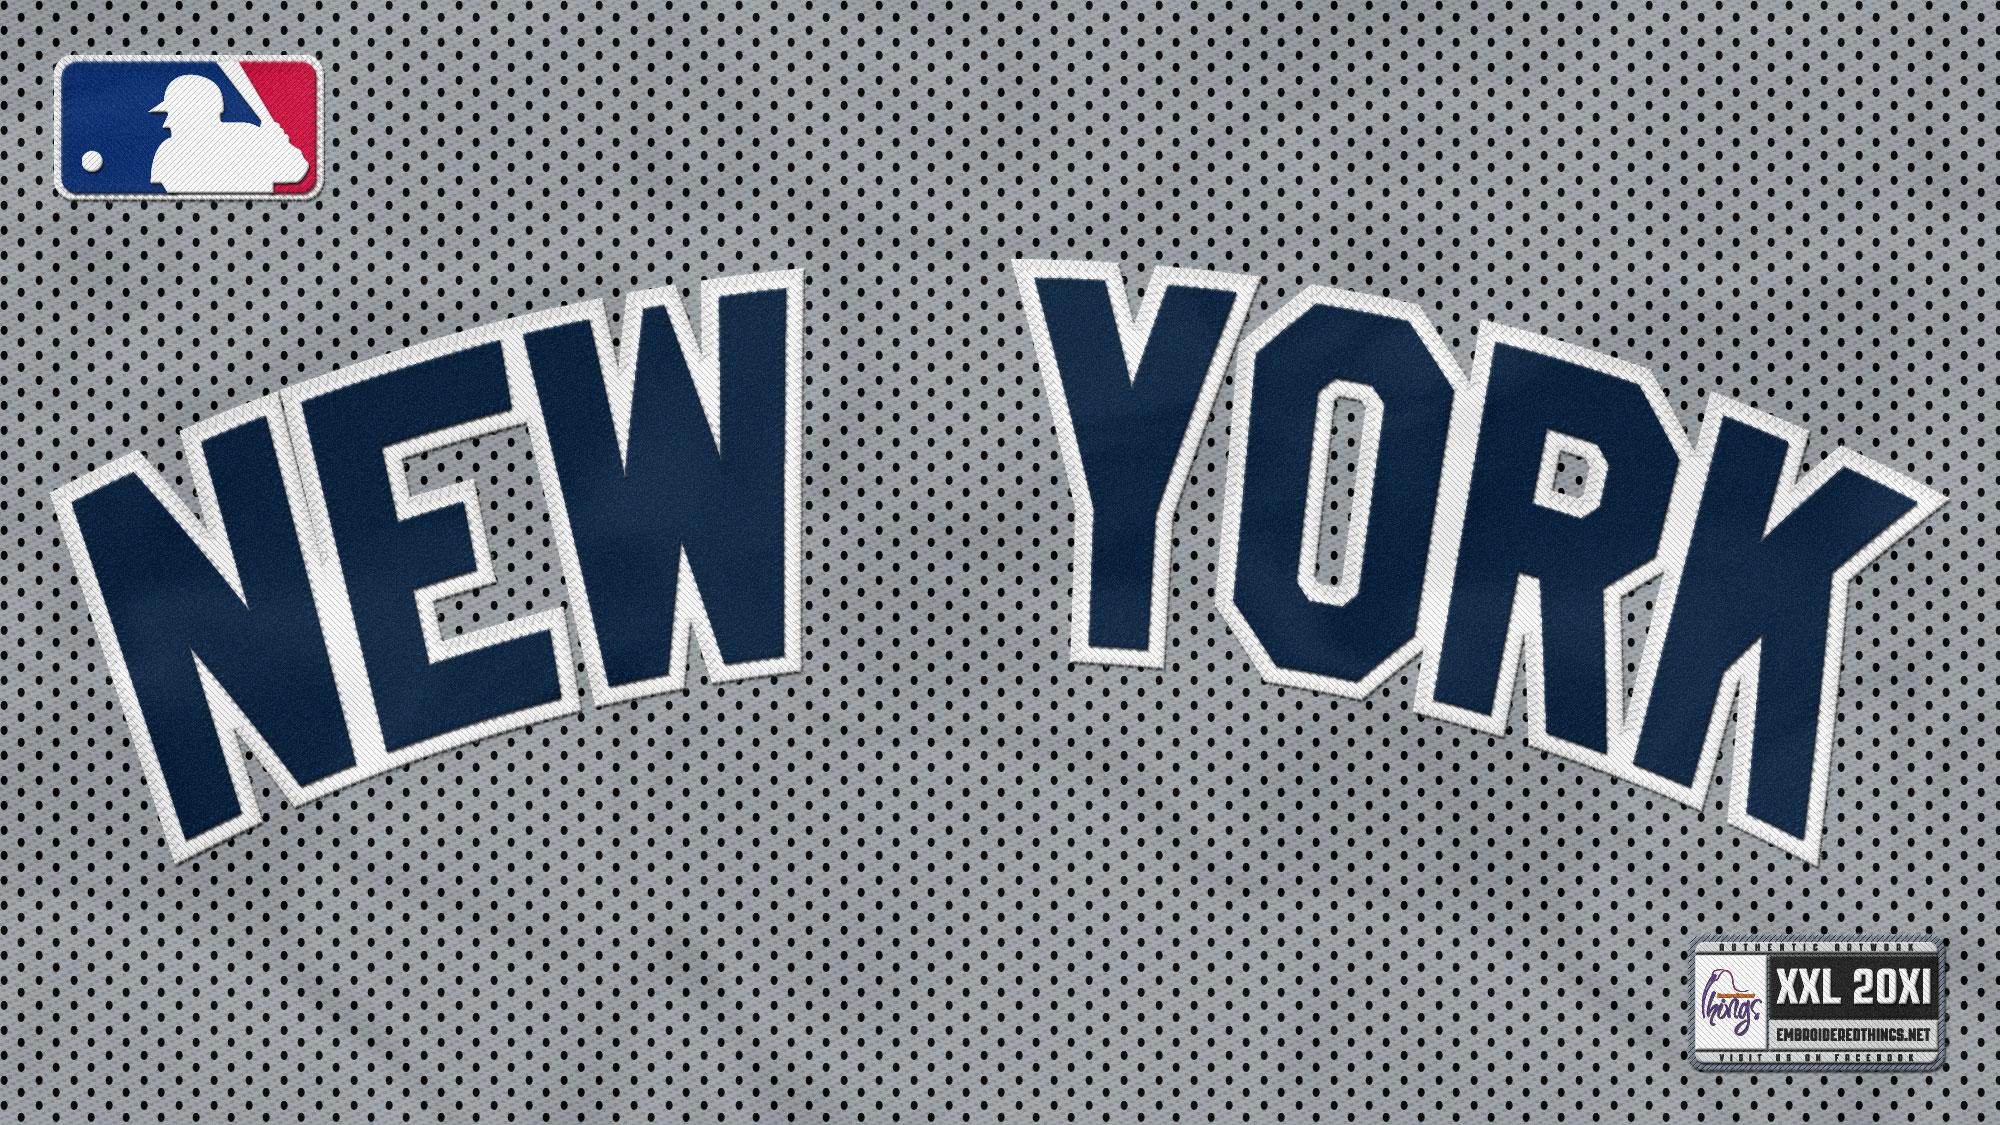 Yankees Iphone 7 Plus Wallpaper New York Yankees Computer Wallpapers Desktop Backgrounds